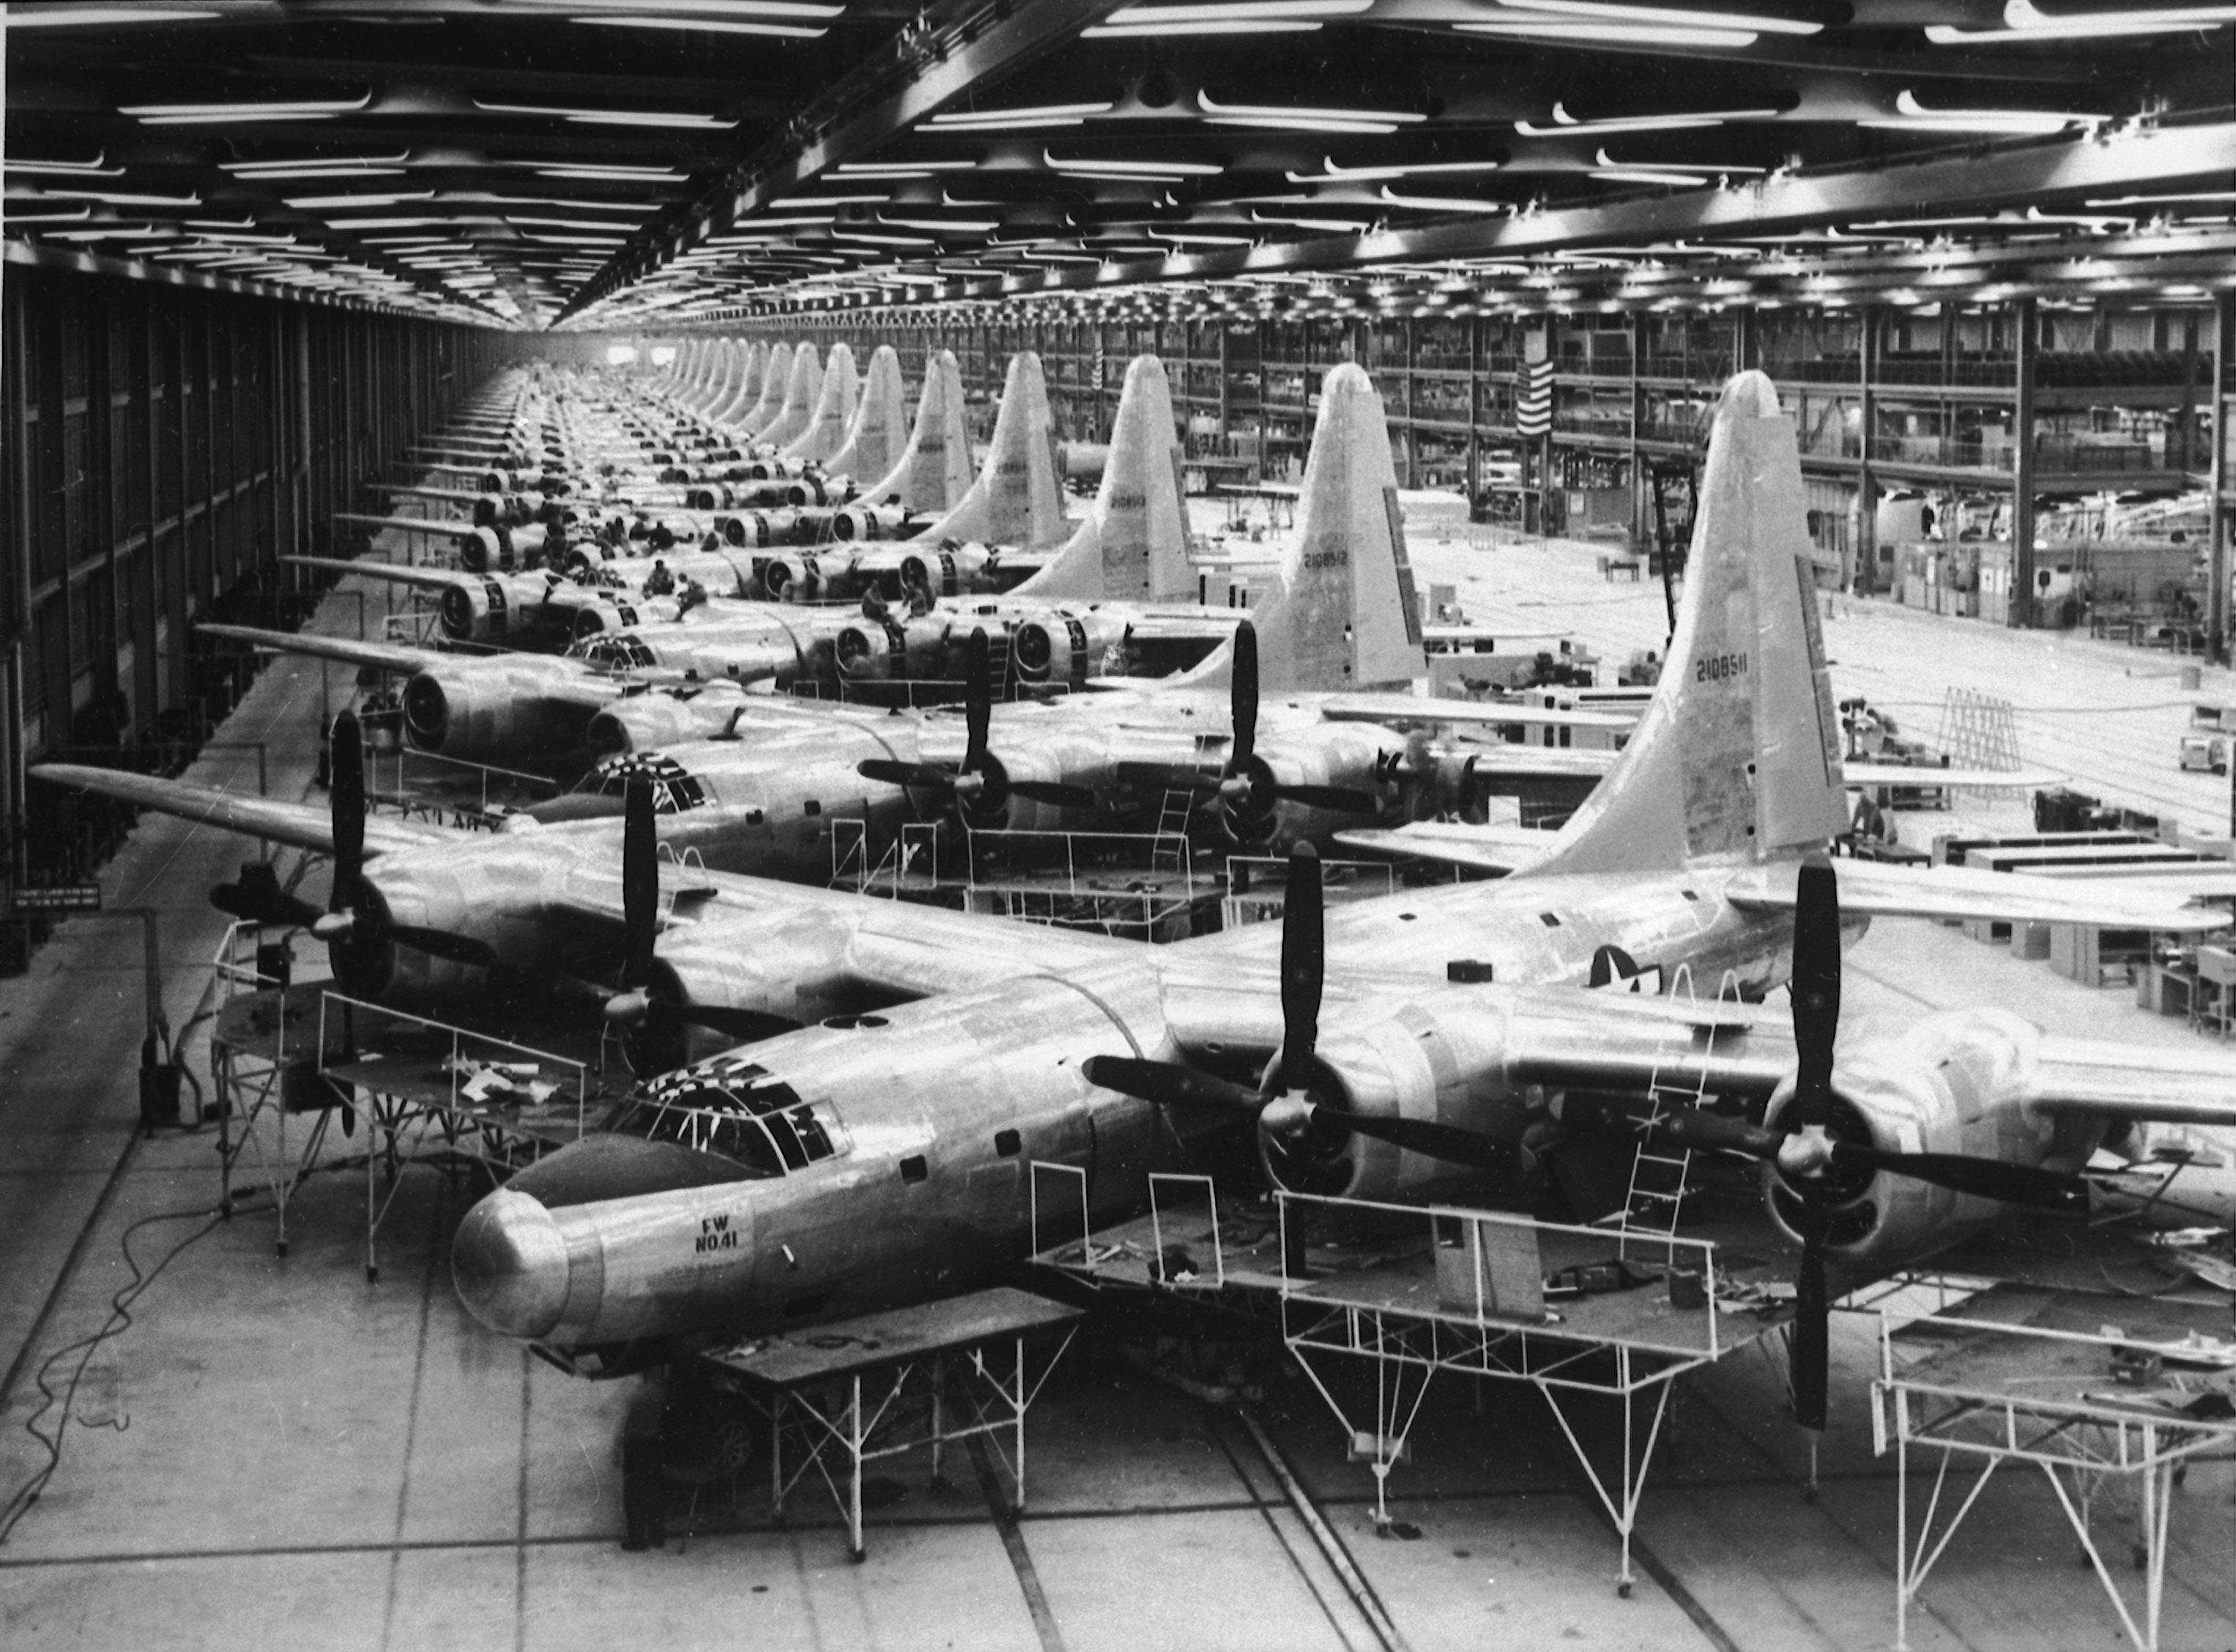 Boeing B-32 Bomber assembly line 1944